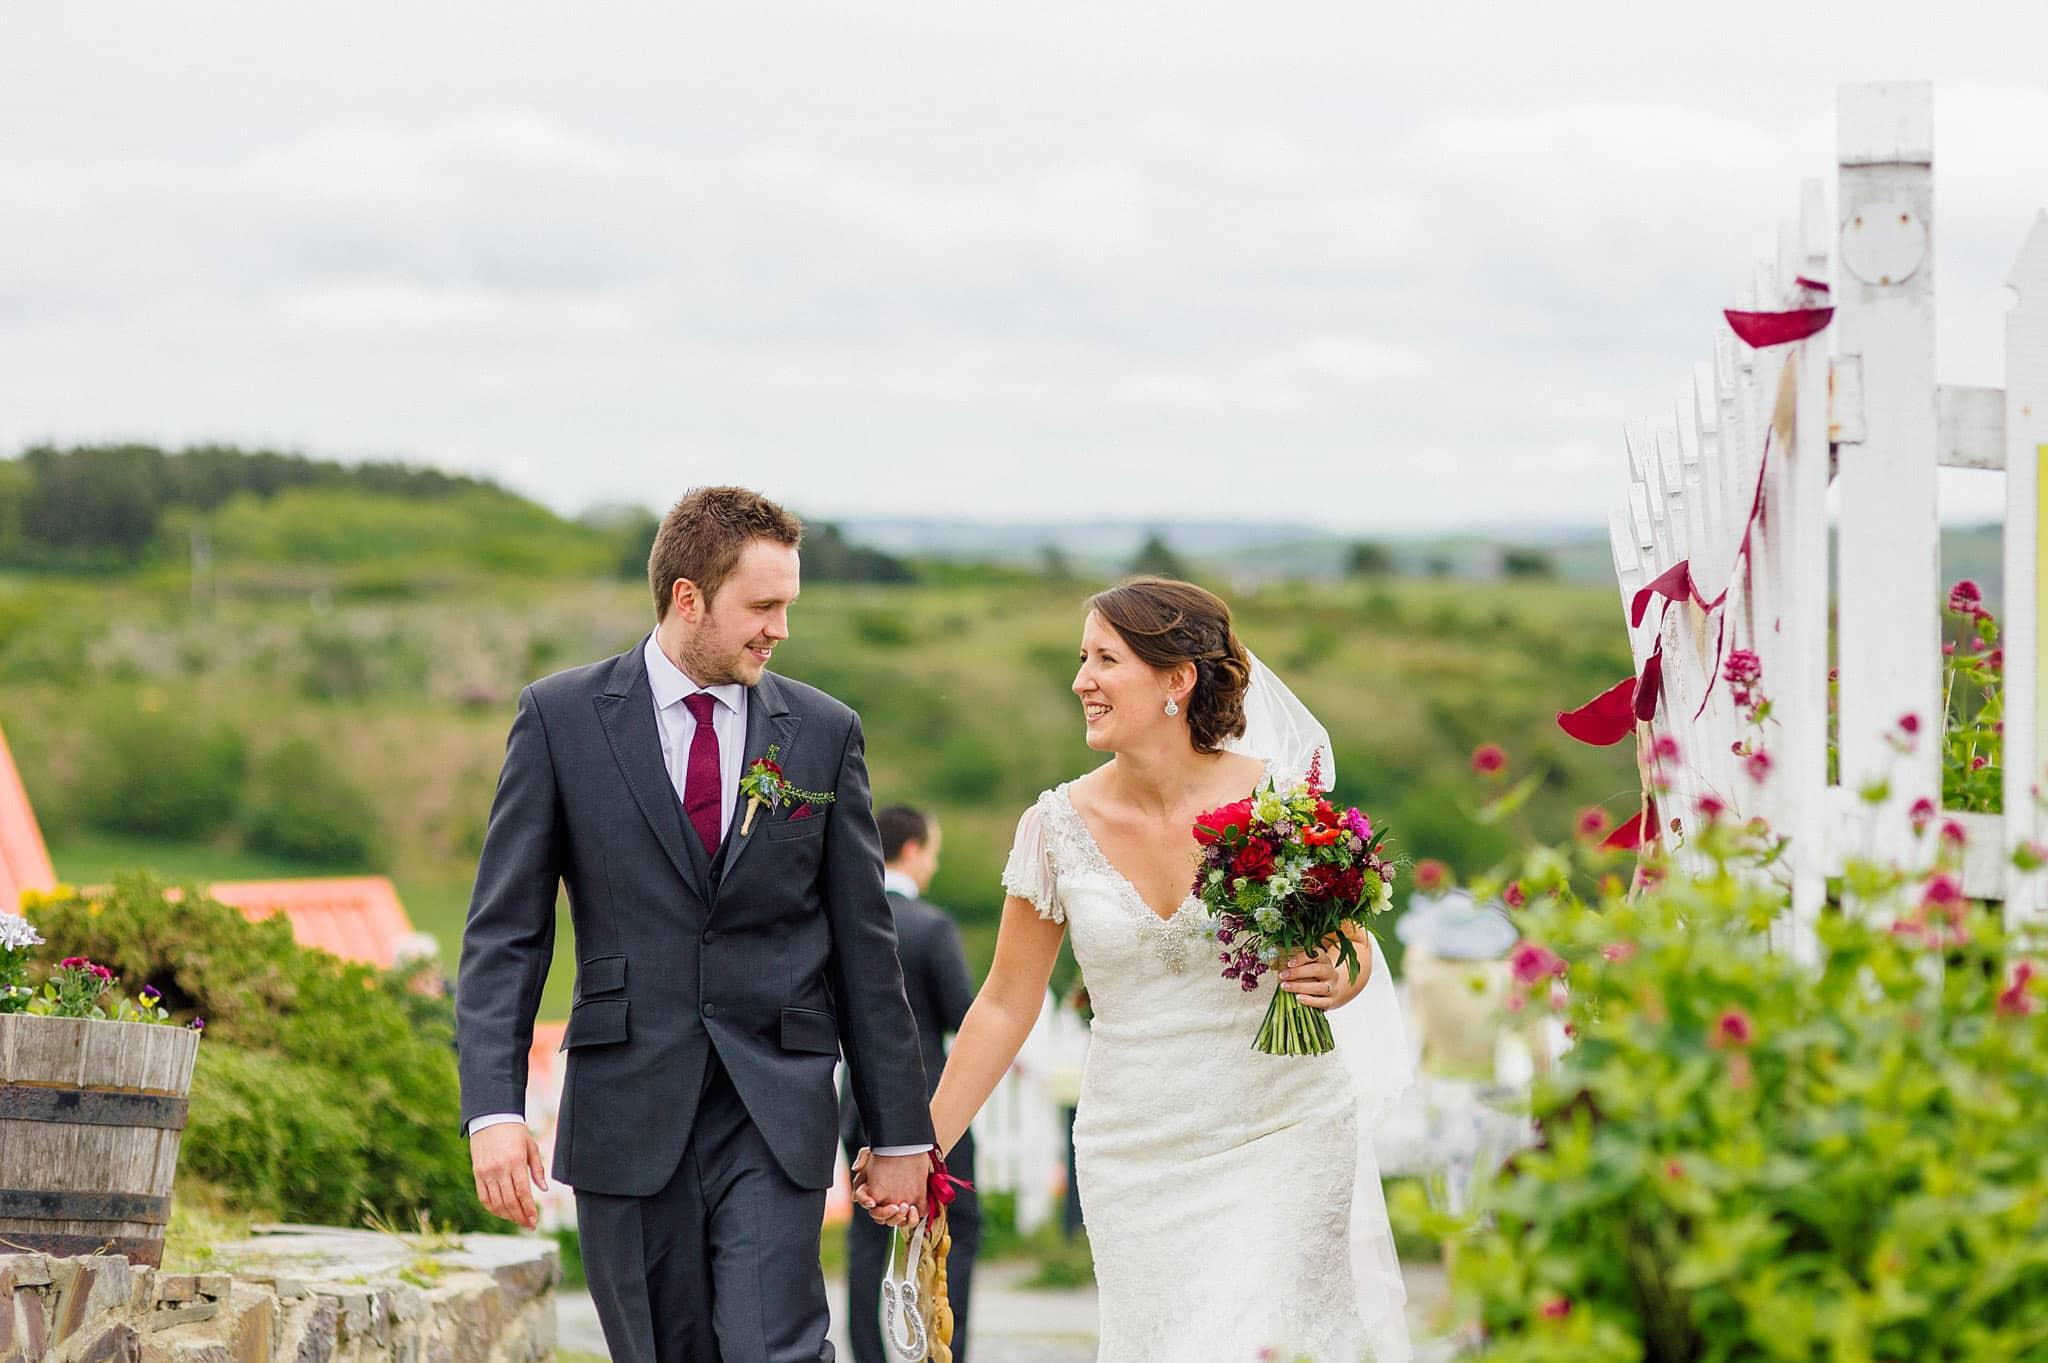 wedding-photographer-aberystwyth-wales (123)